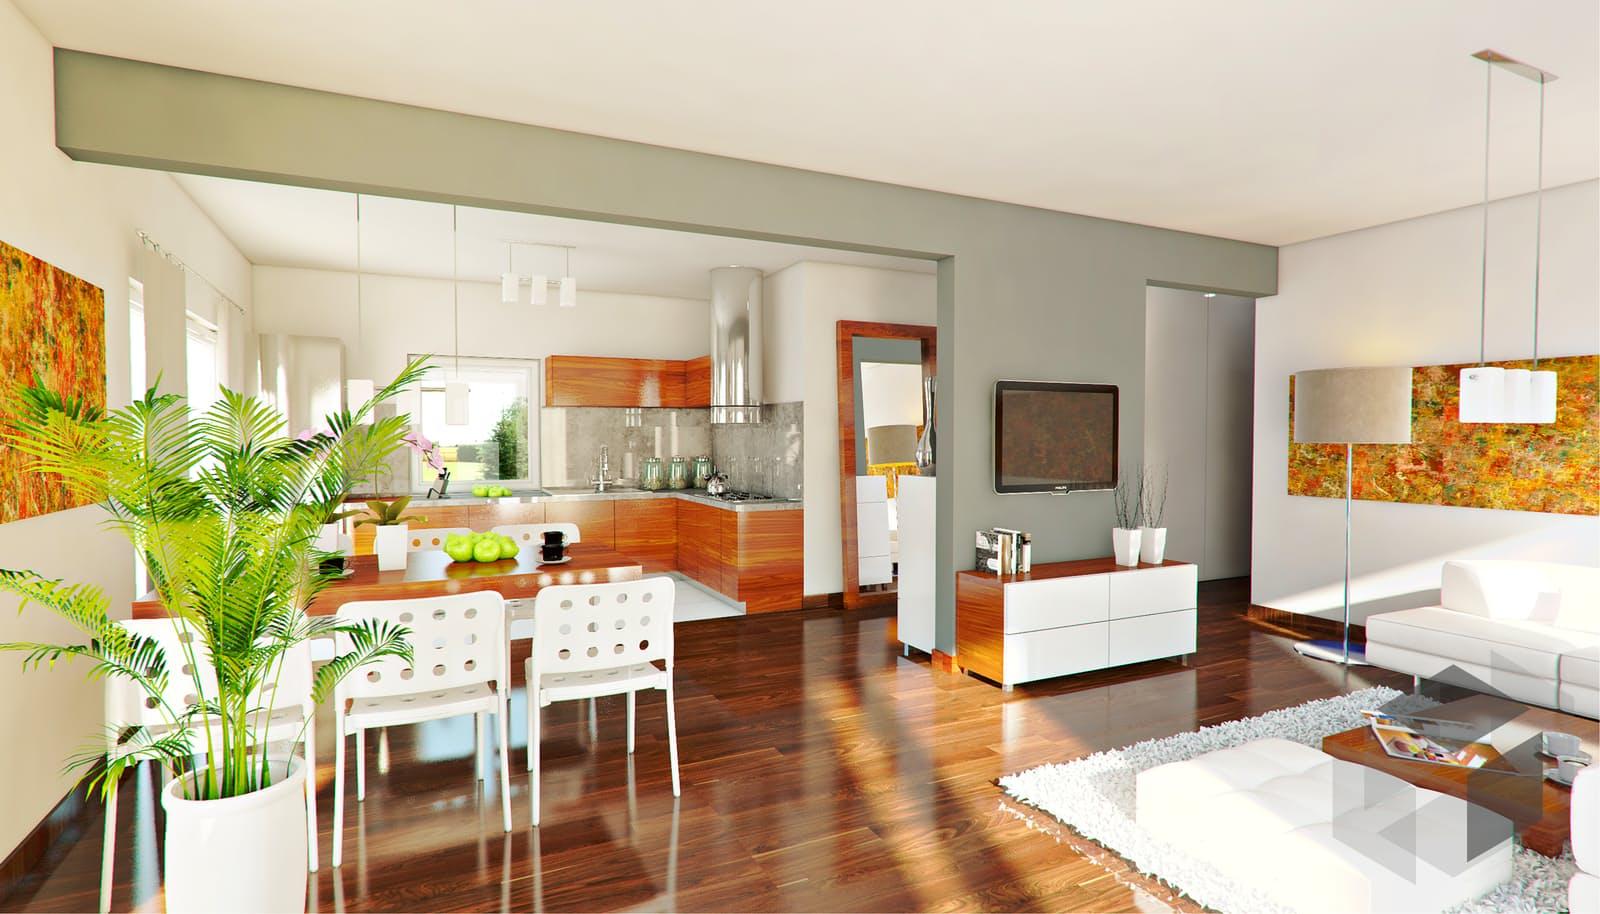 fertighaus perfect 98 von dan wood. Black Bedroom Furniture Sets. Home Design Ideas